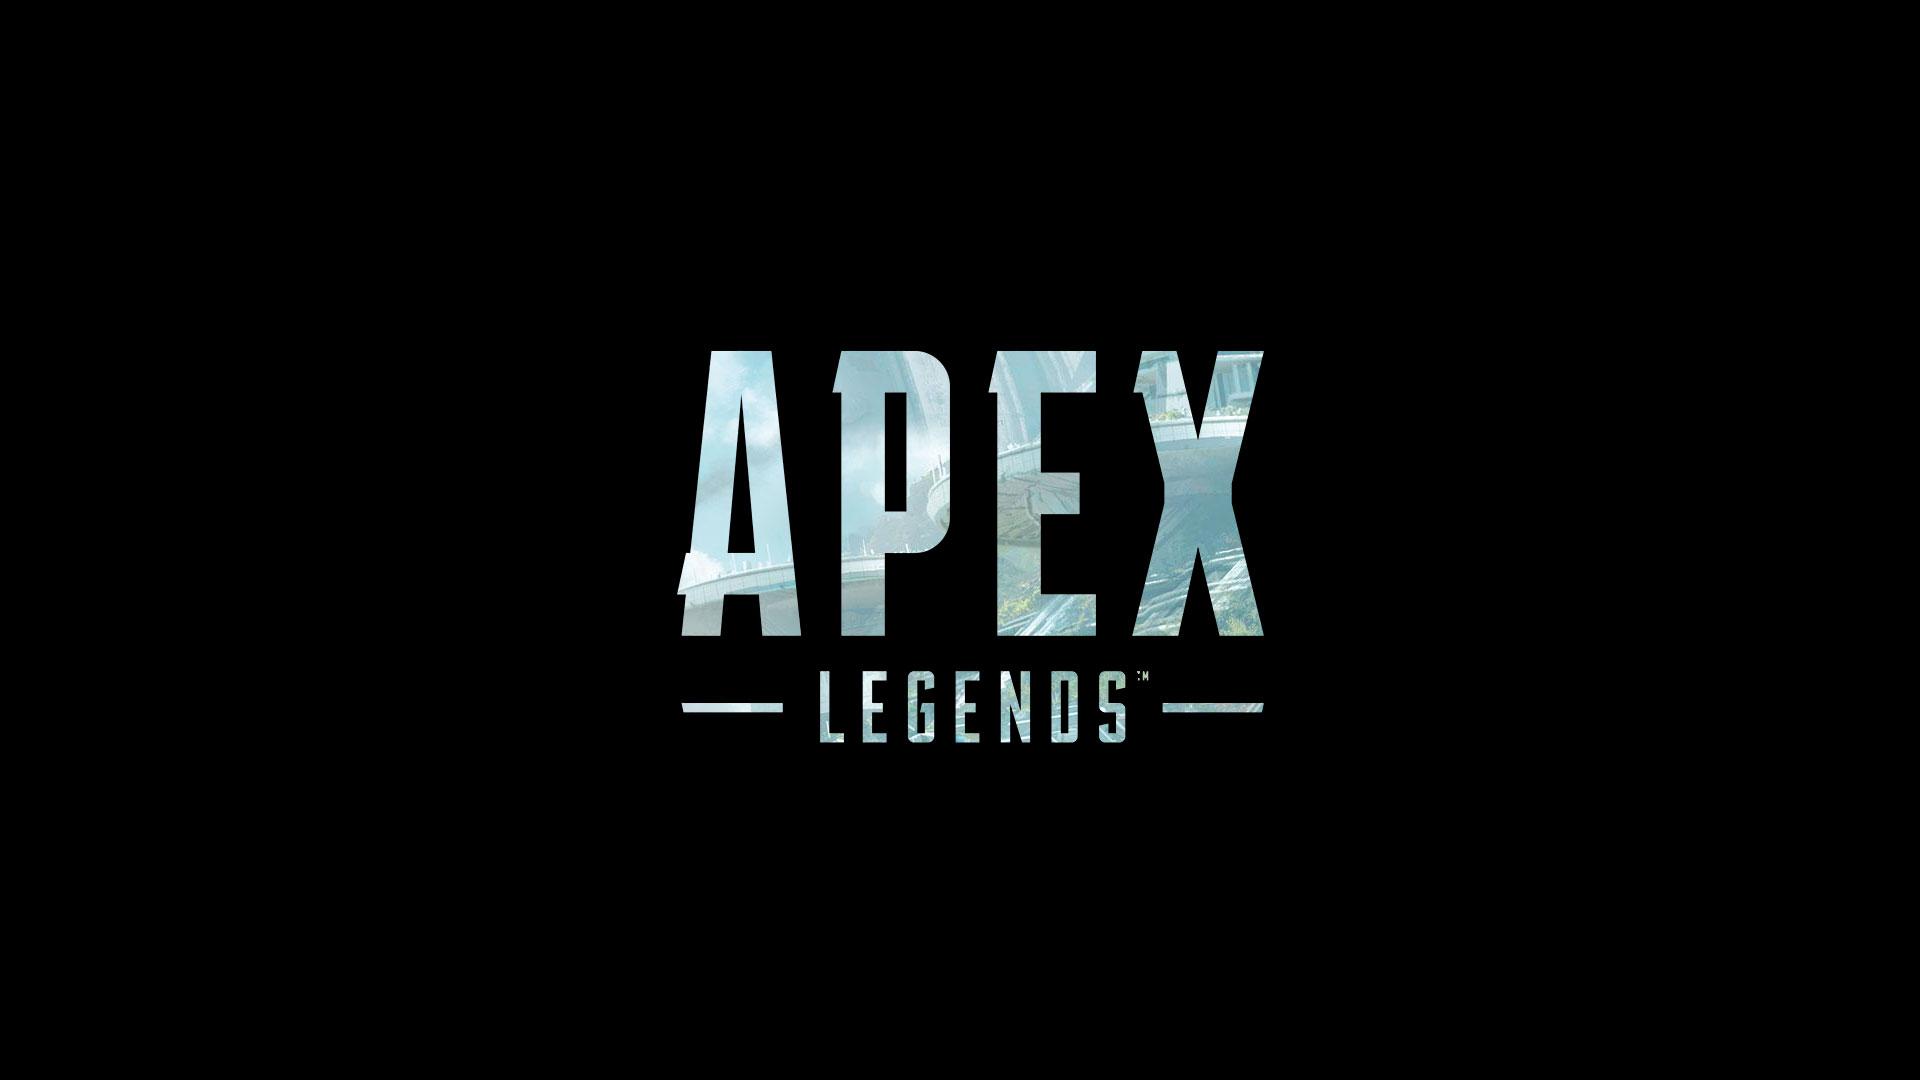 apex legends logo desktop wallpaper 72678